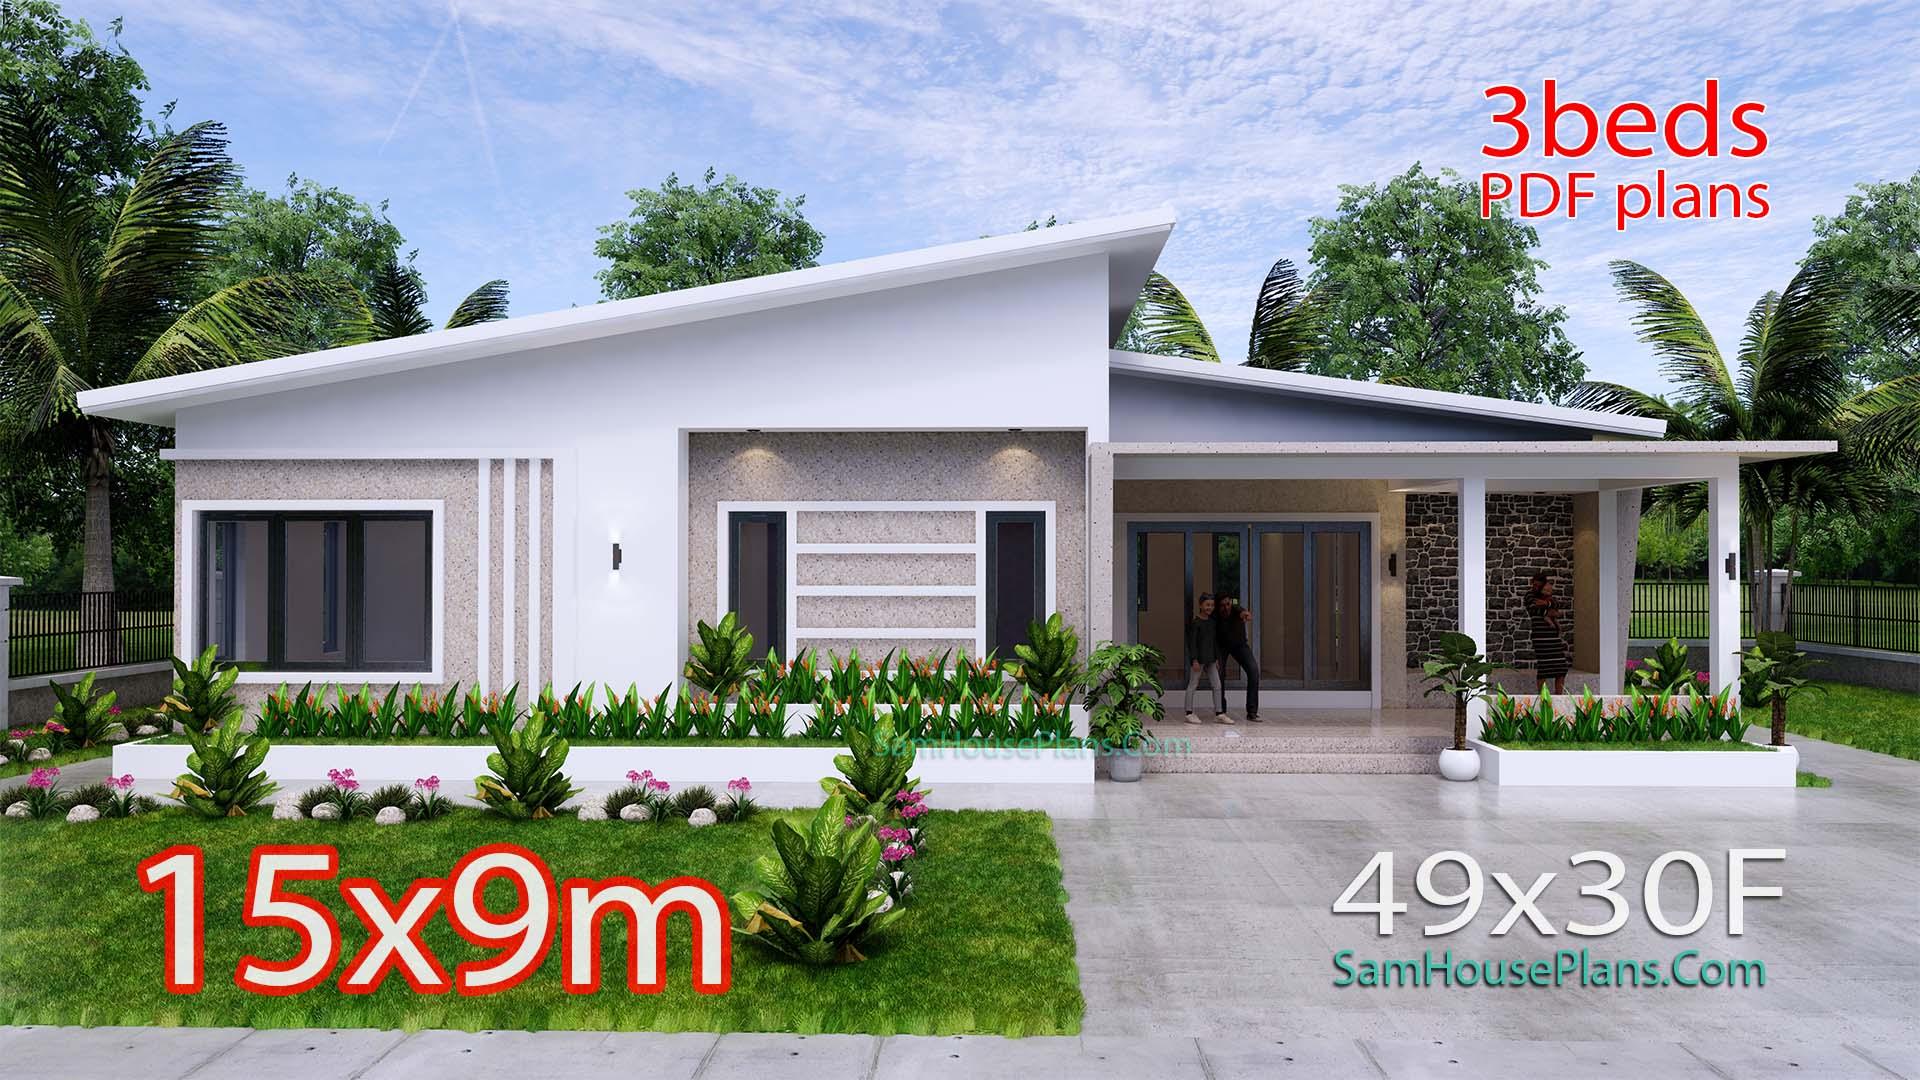 Modern House Plan 15x9 M 49x30 Feet 3 Beds PDF Plan 3d